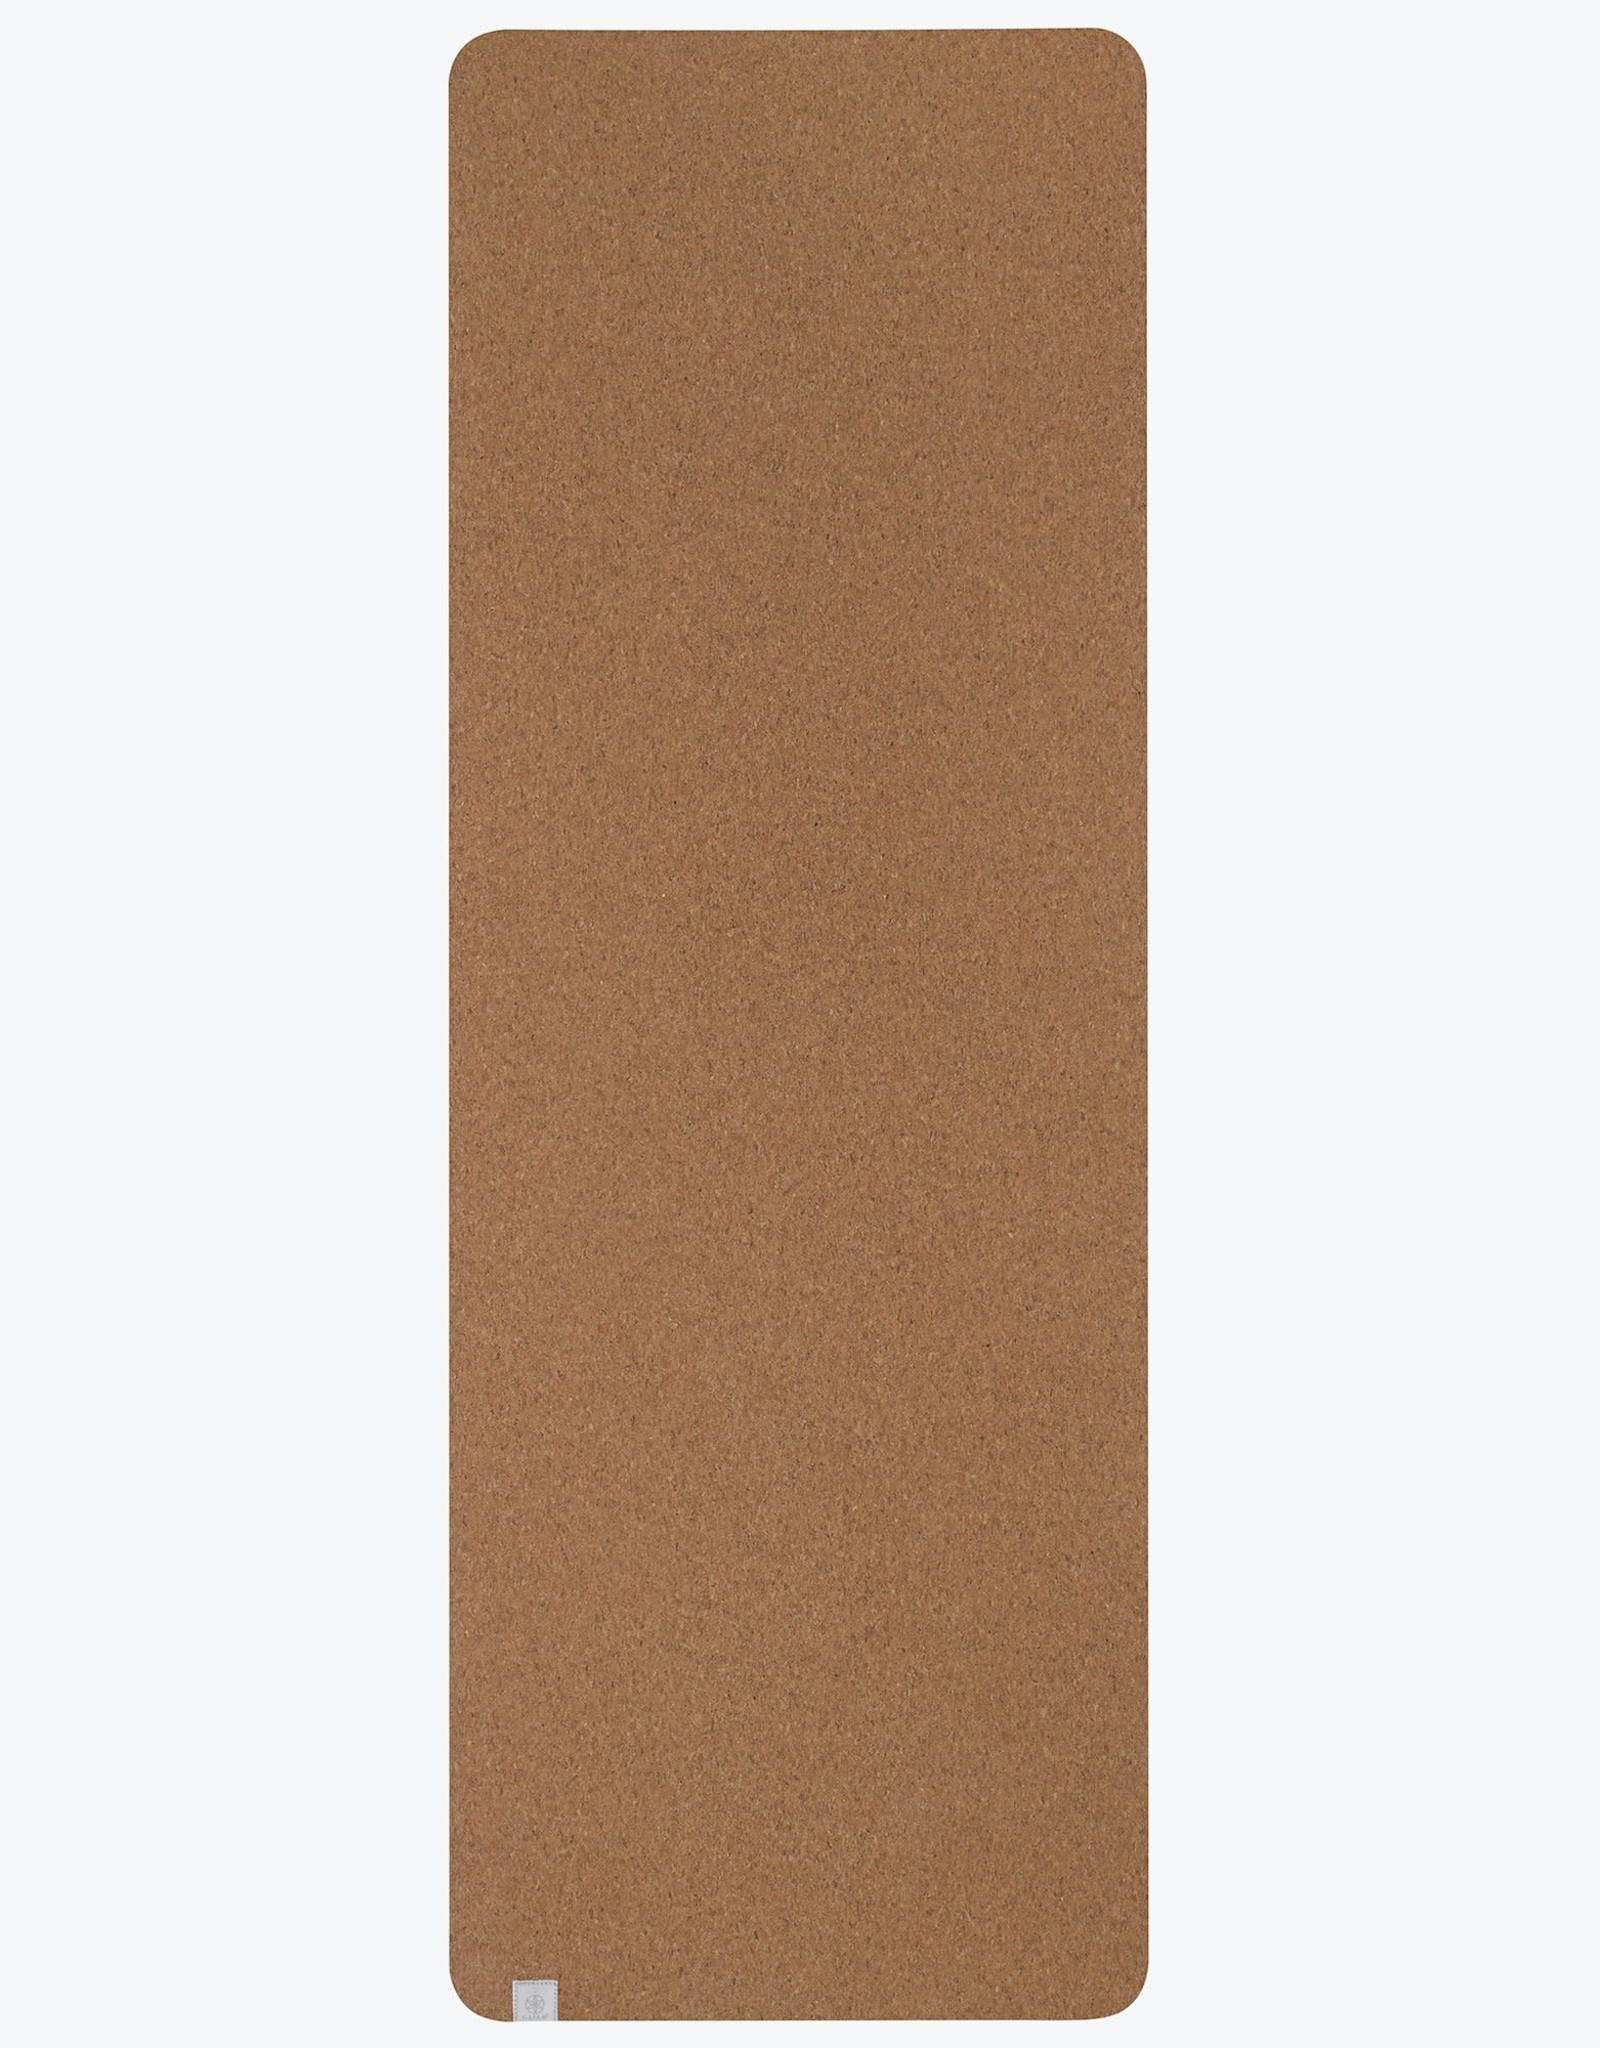 Gaiam Performance Cork ECO Yoga Mat 5mm